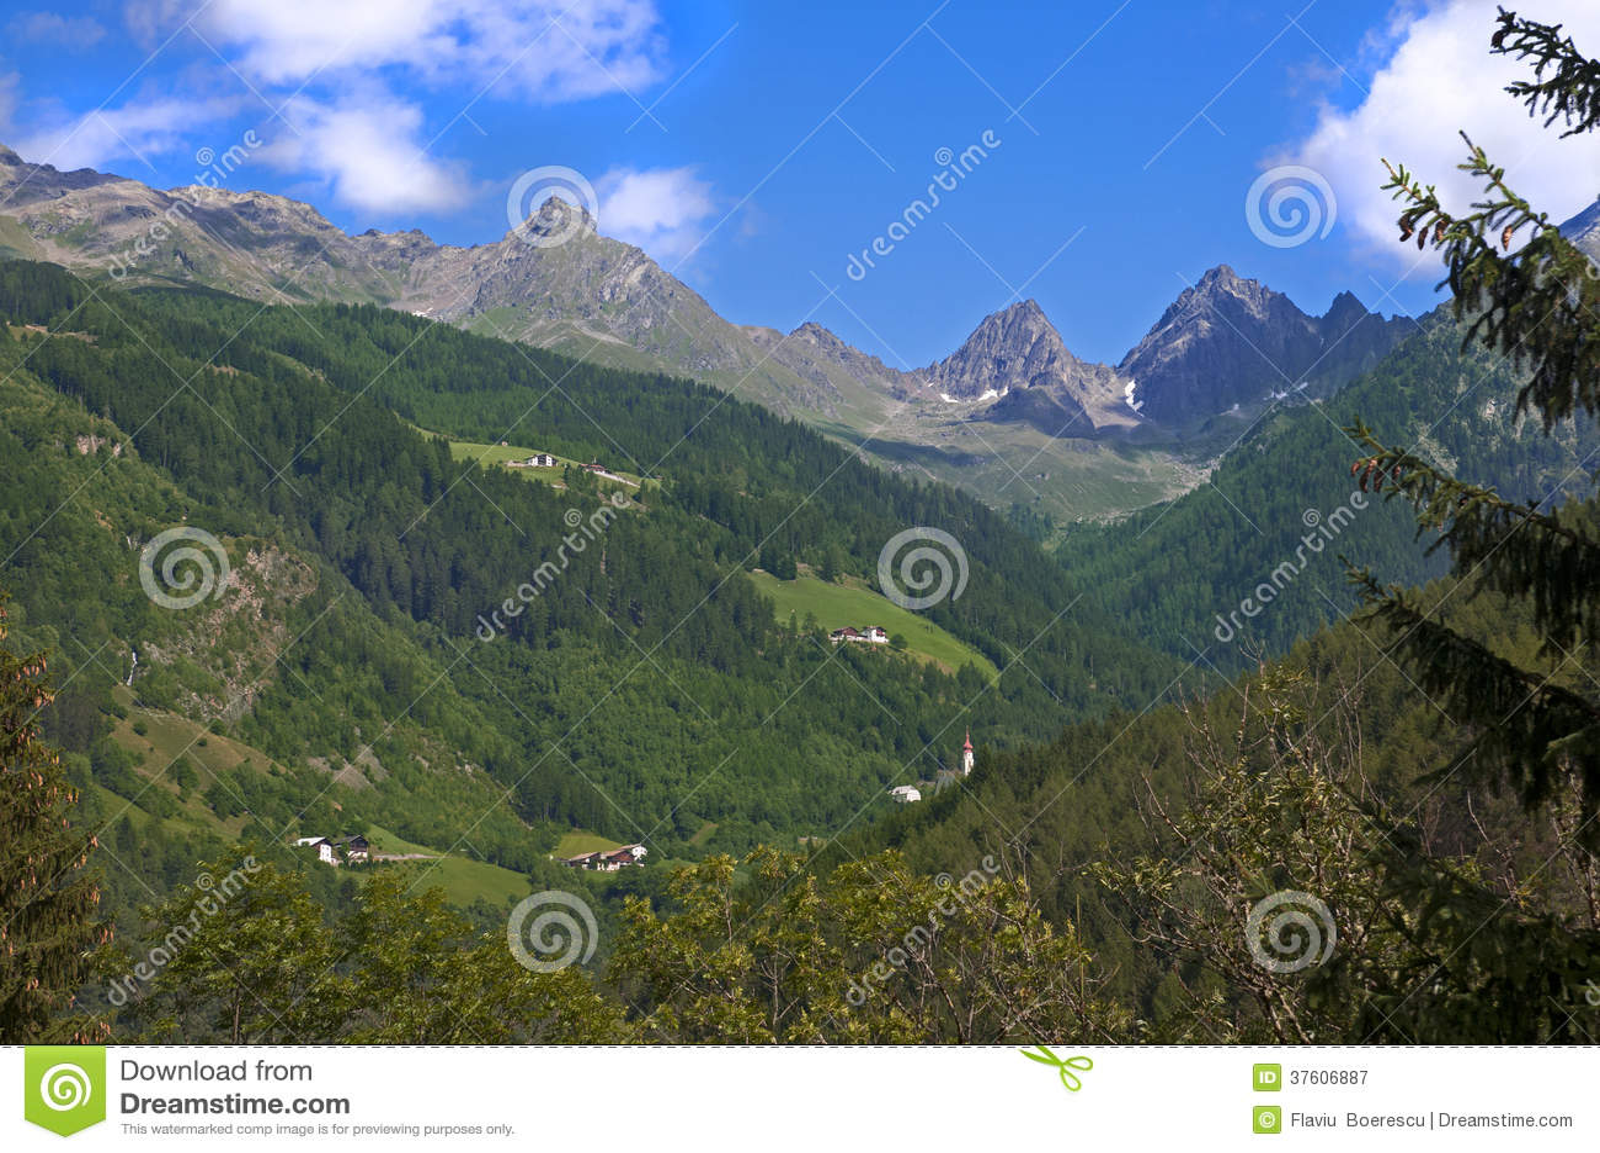 Mountain landscape in Austria Tirol